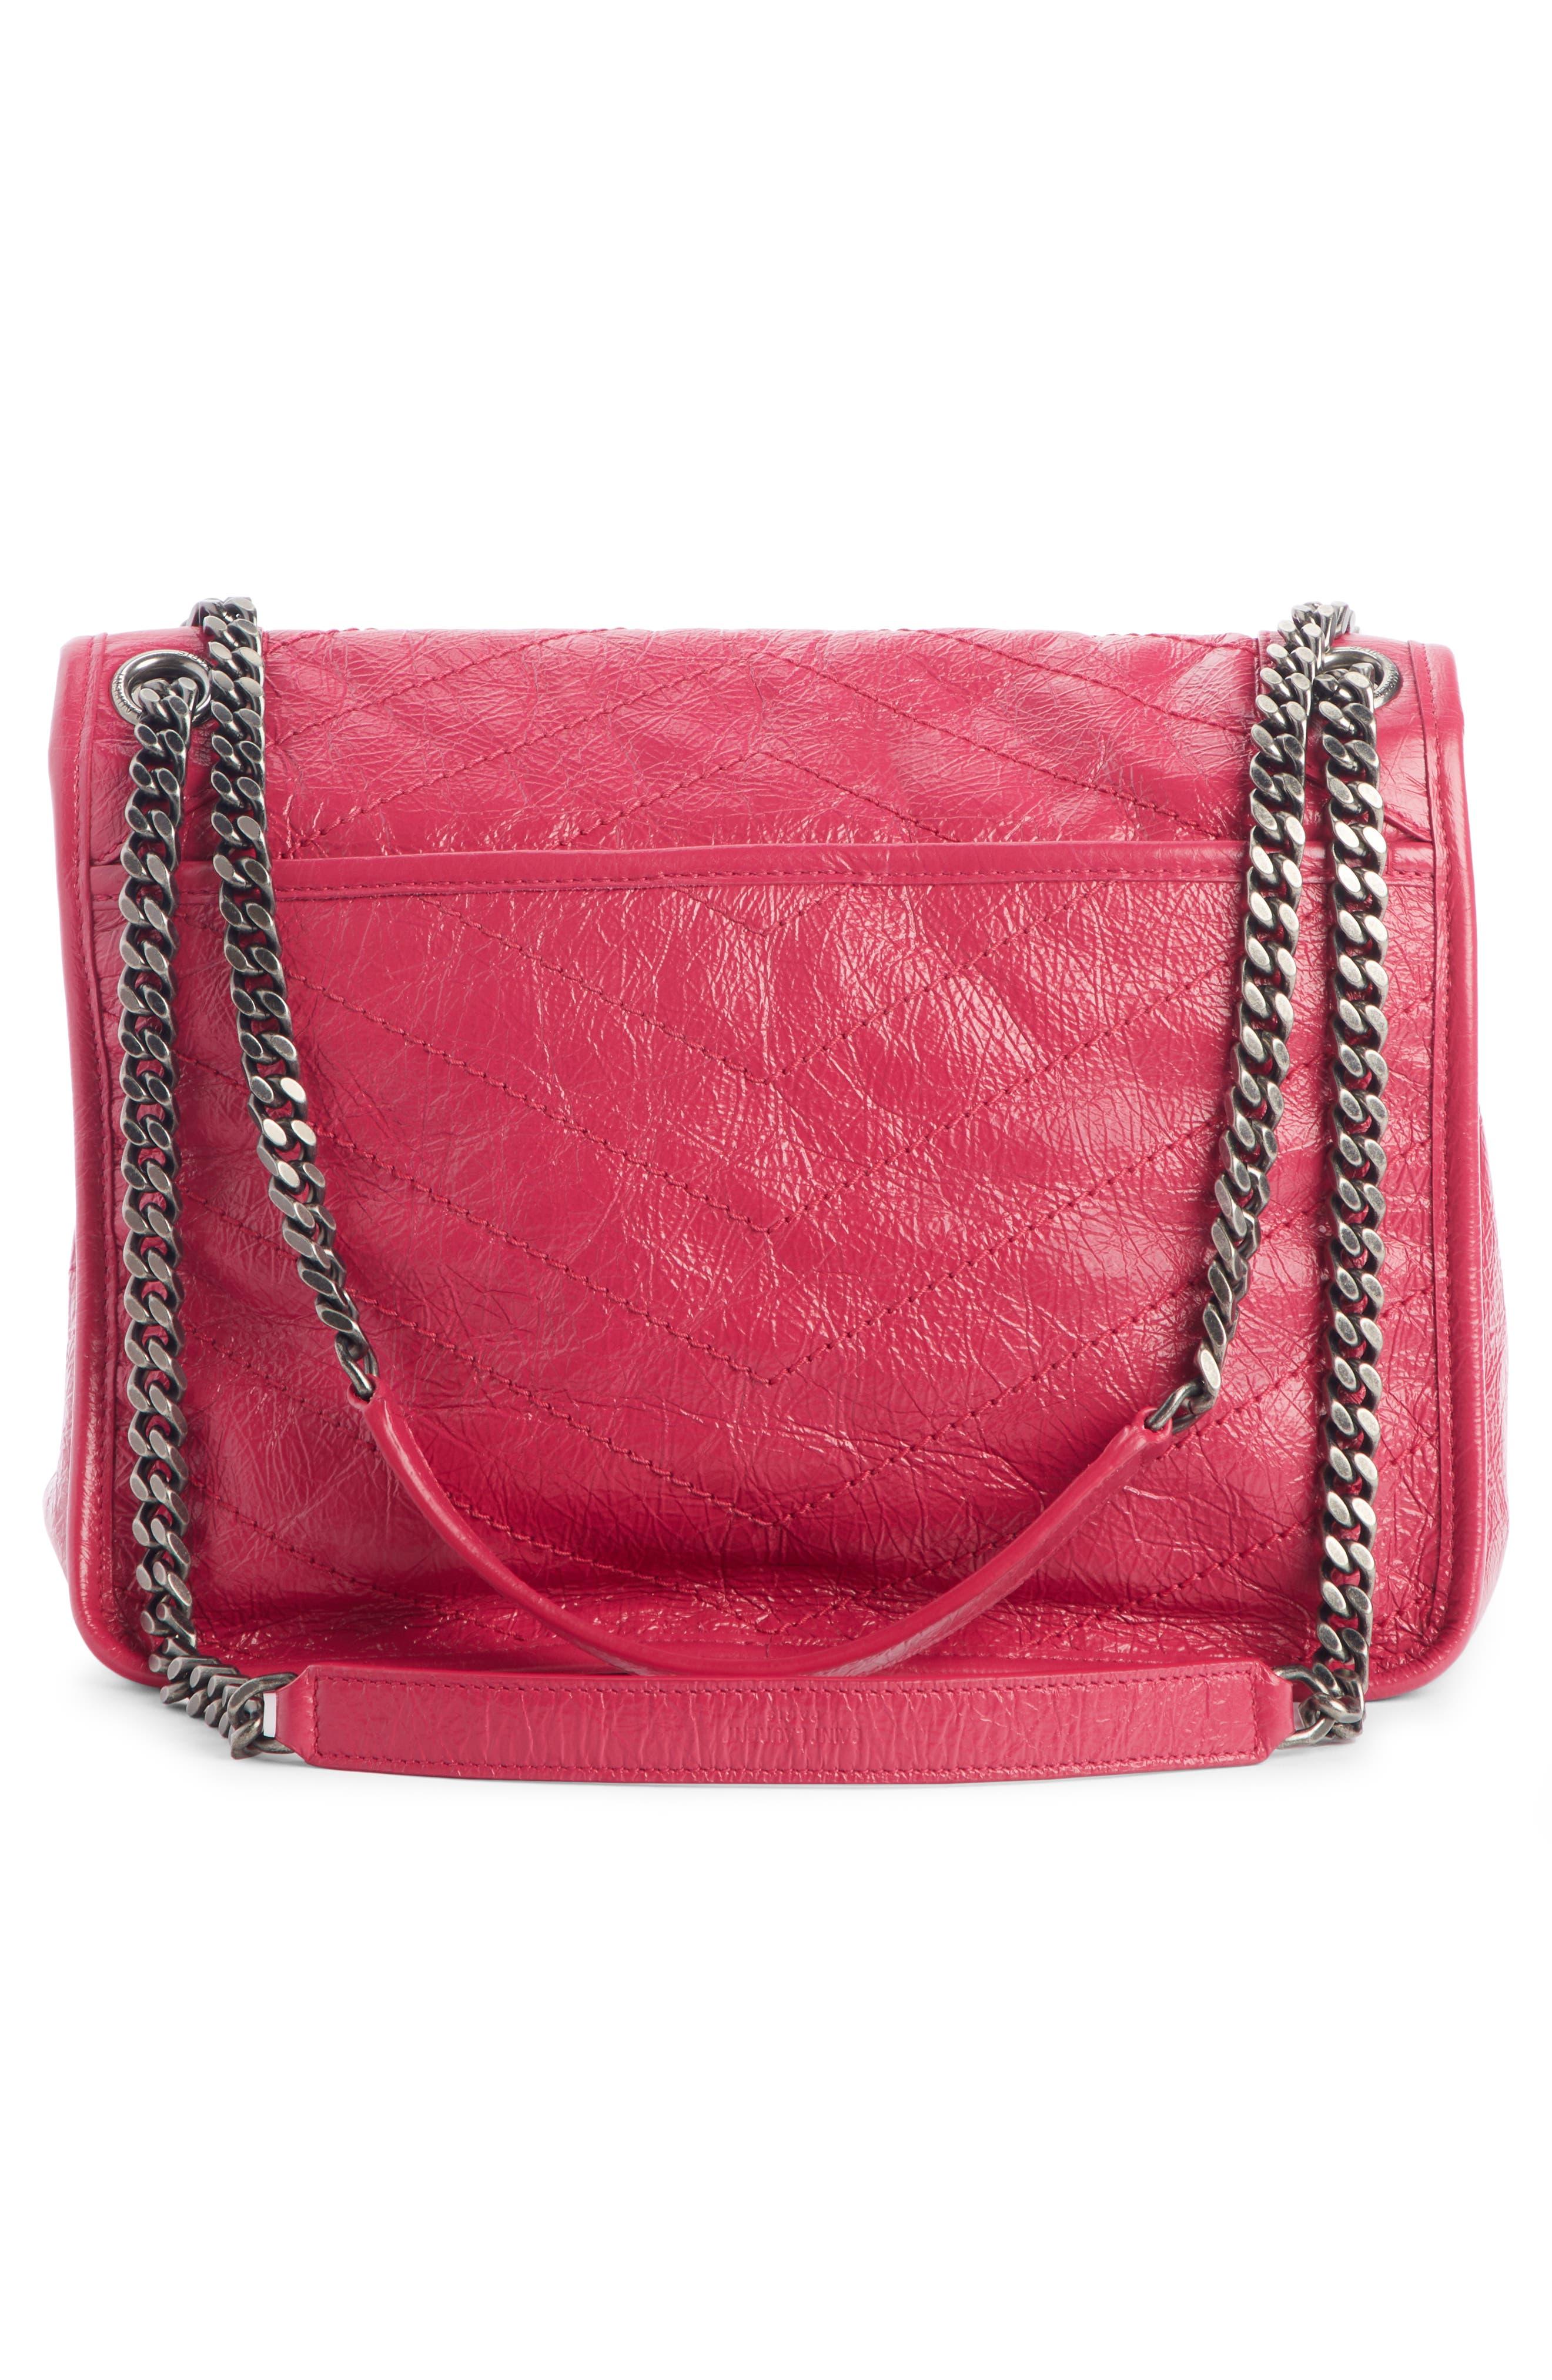 ,                             Medium Niki Leather Shoulder Bag,                             Alternate thumbnail 3, color,                             FREESIA/ FREESIA